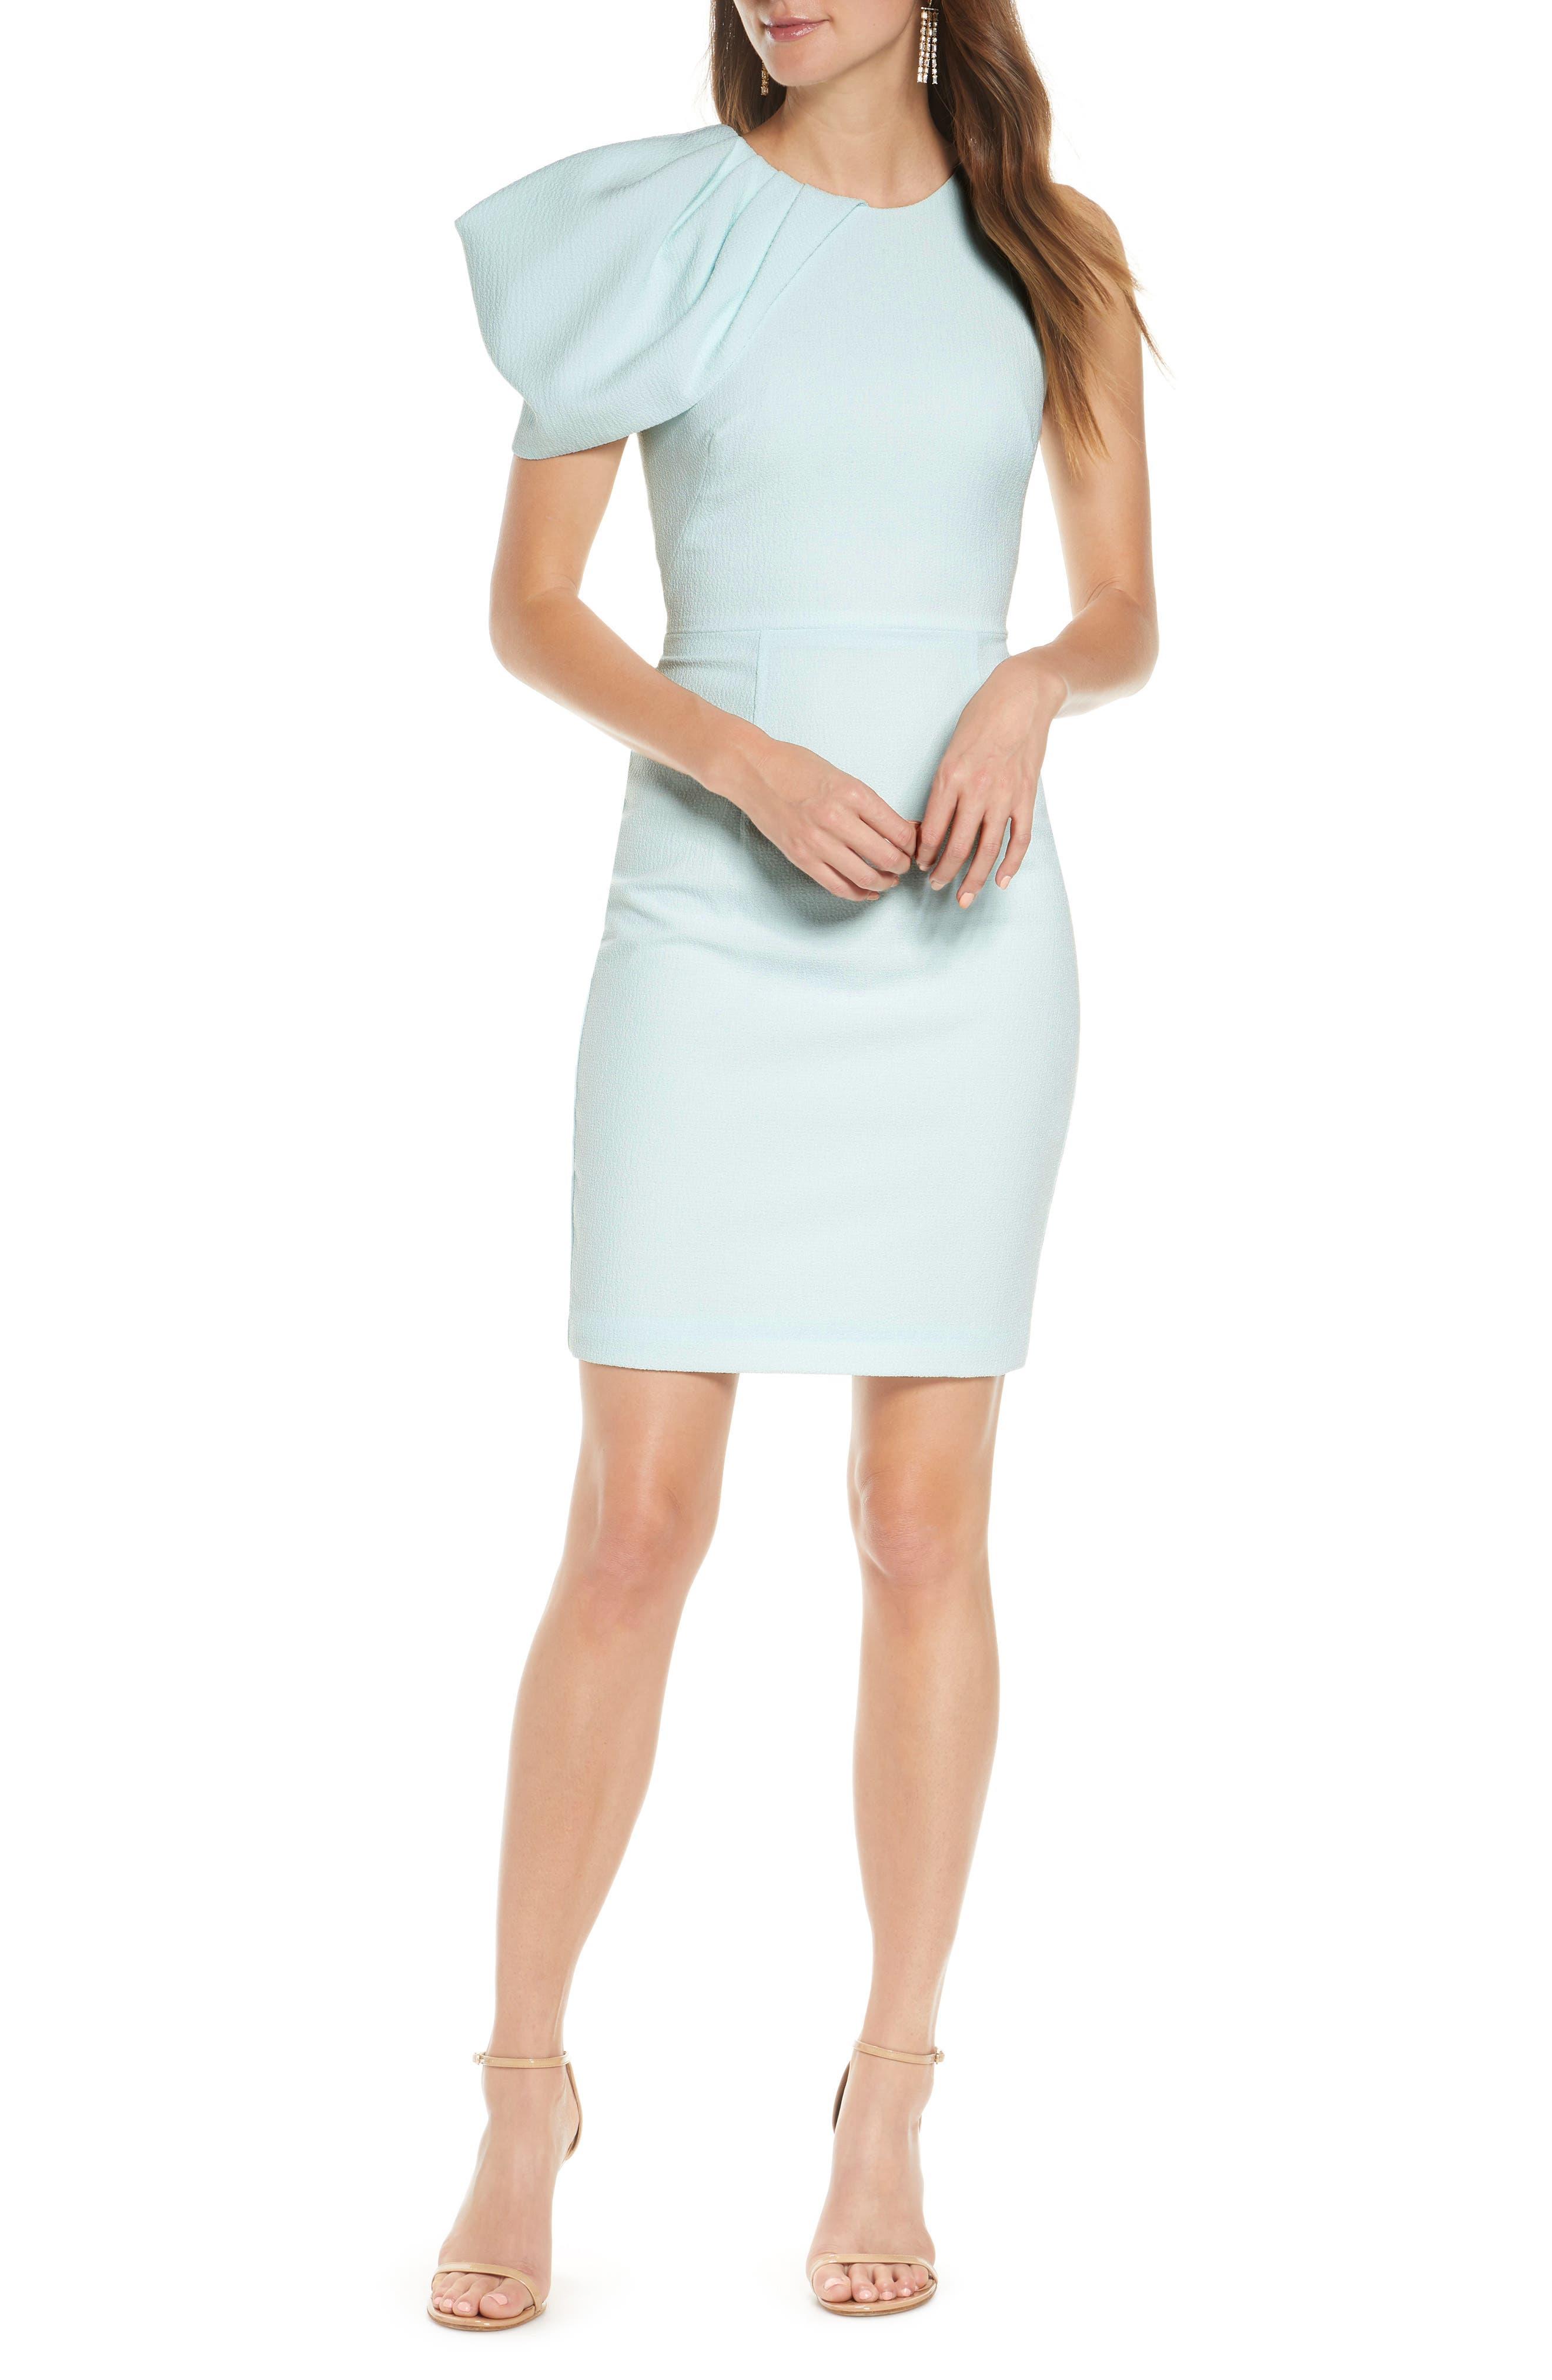 Aldo One-Shoulder Ruffle Sheath Dress